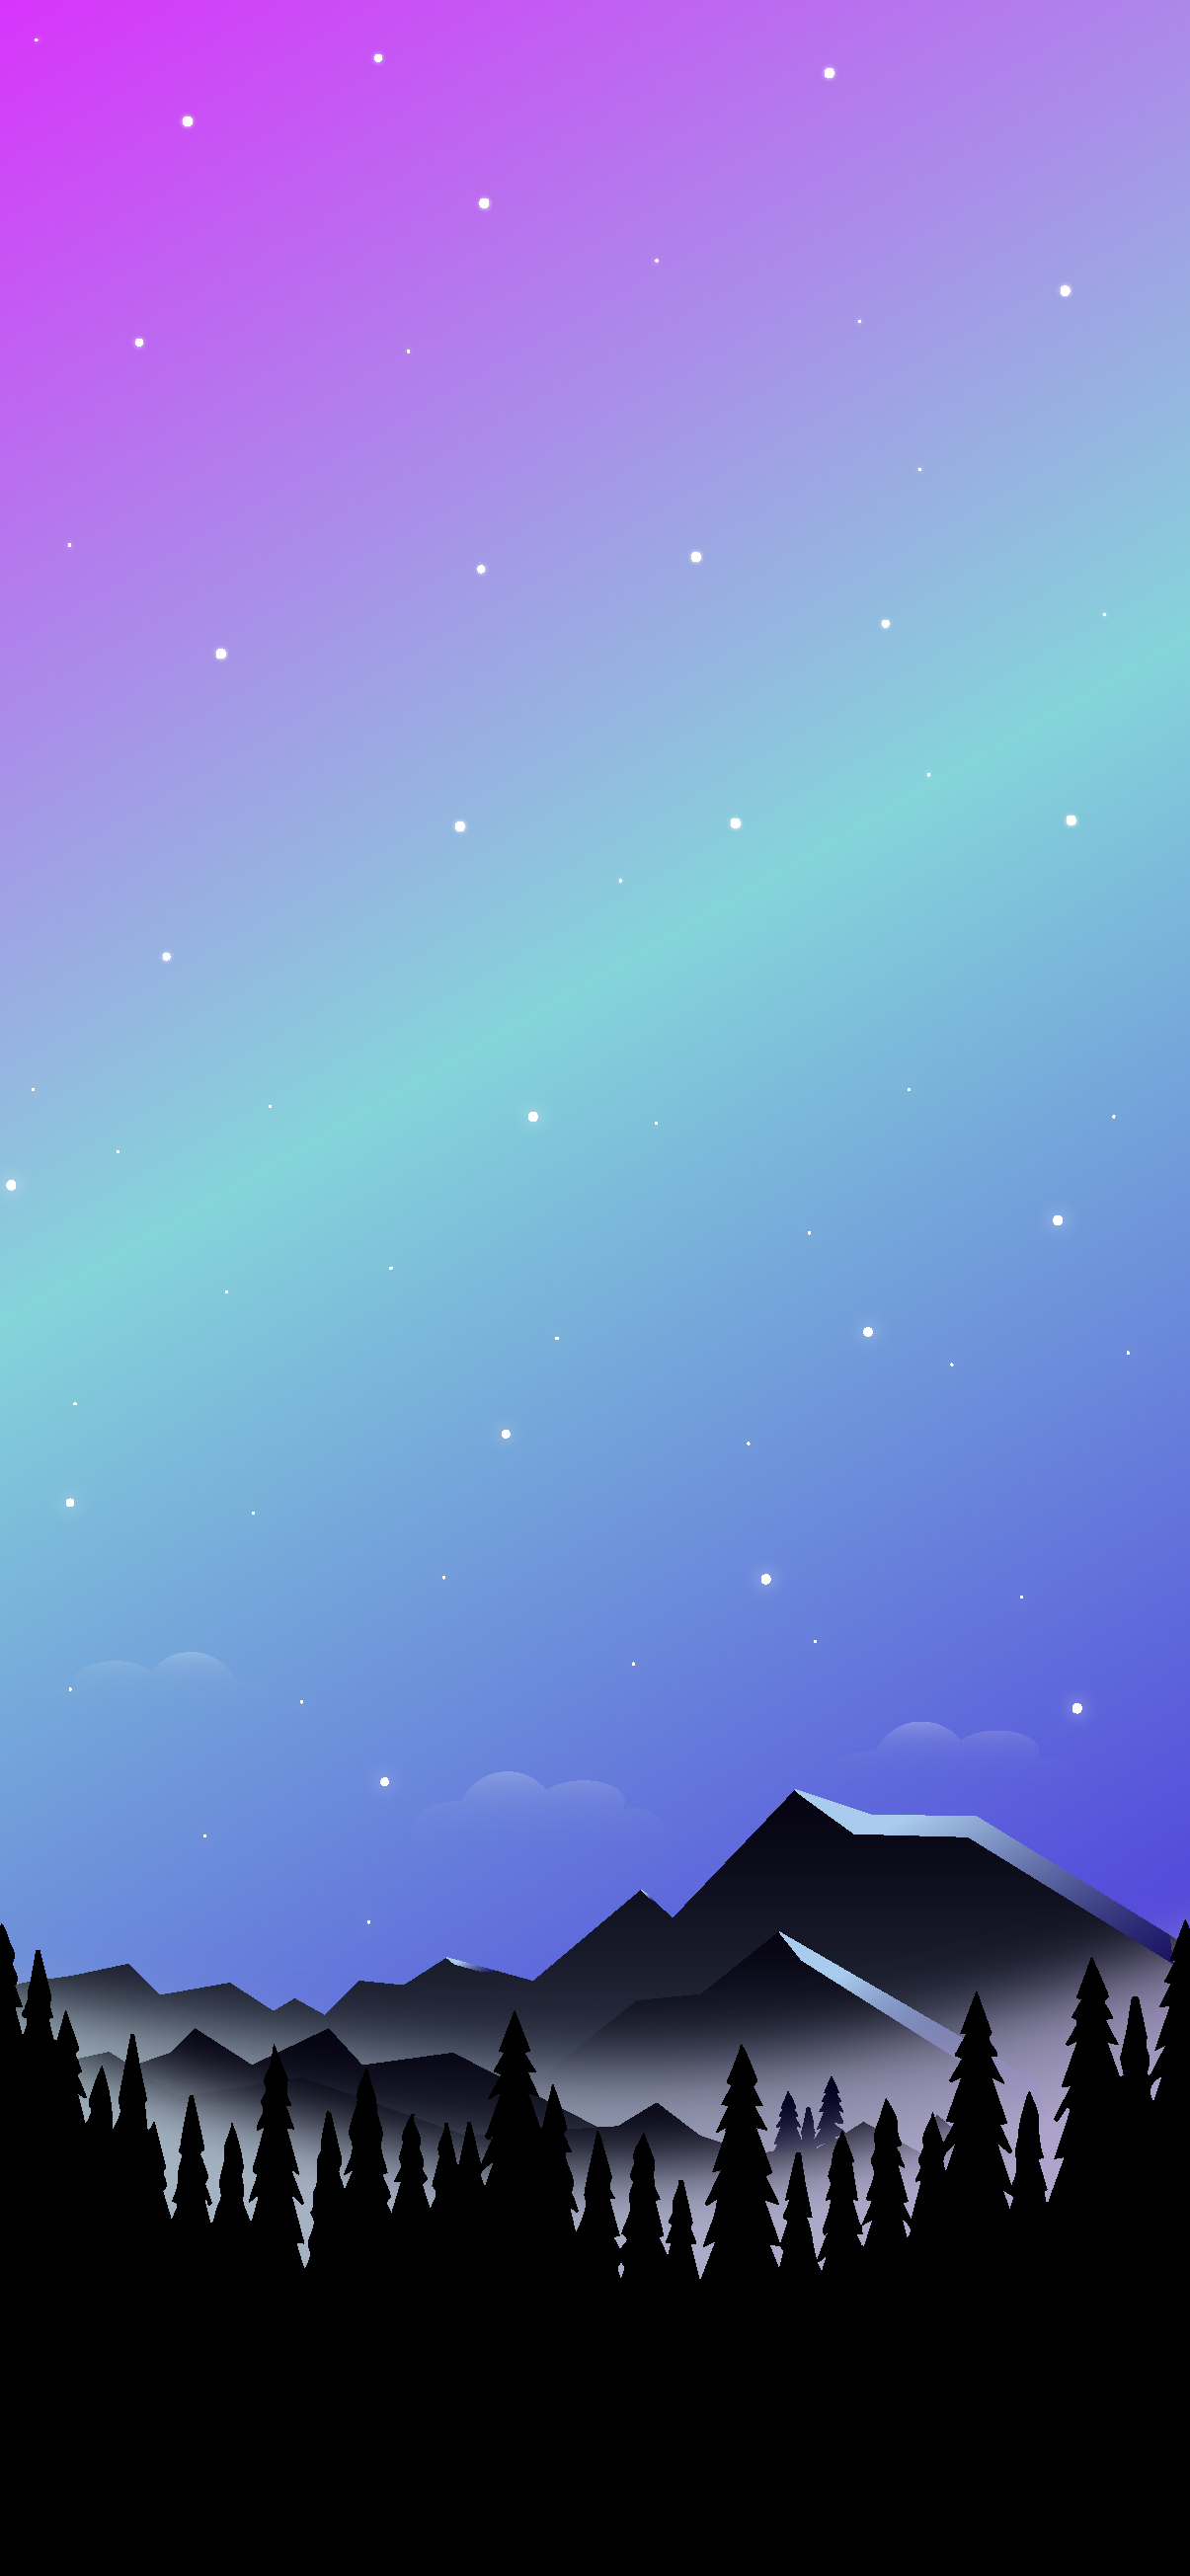 Wallpaper iphone landscape HD 2